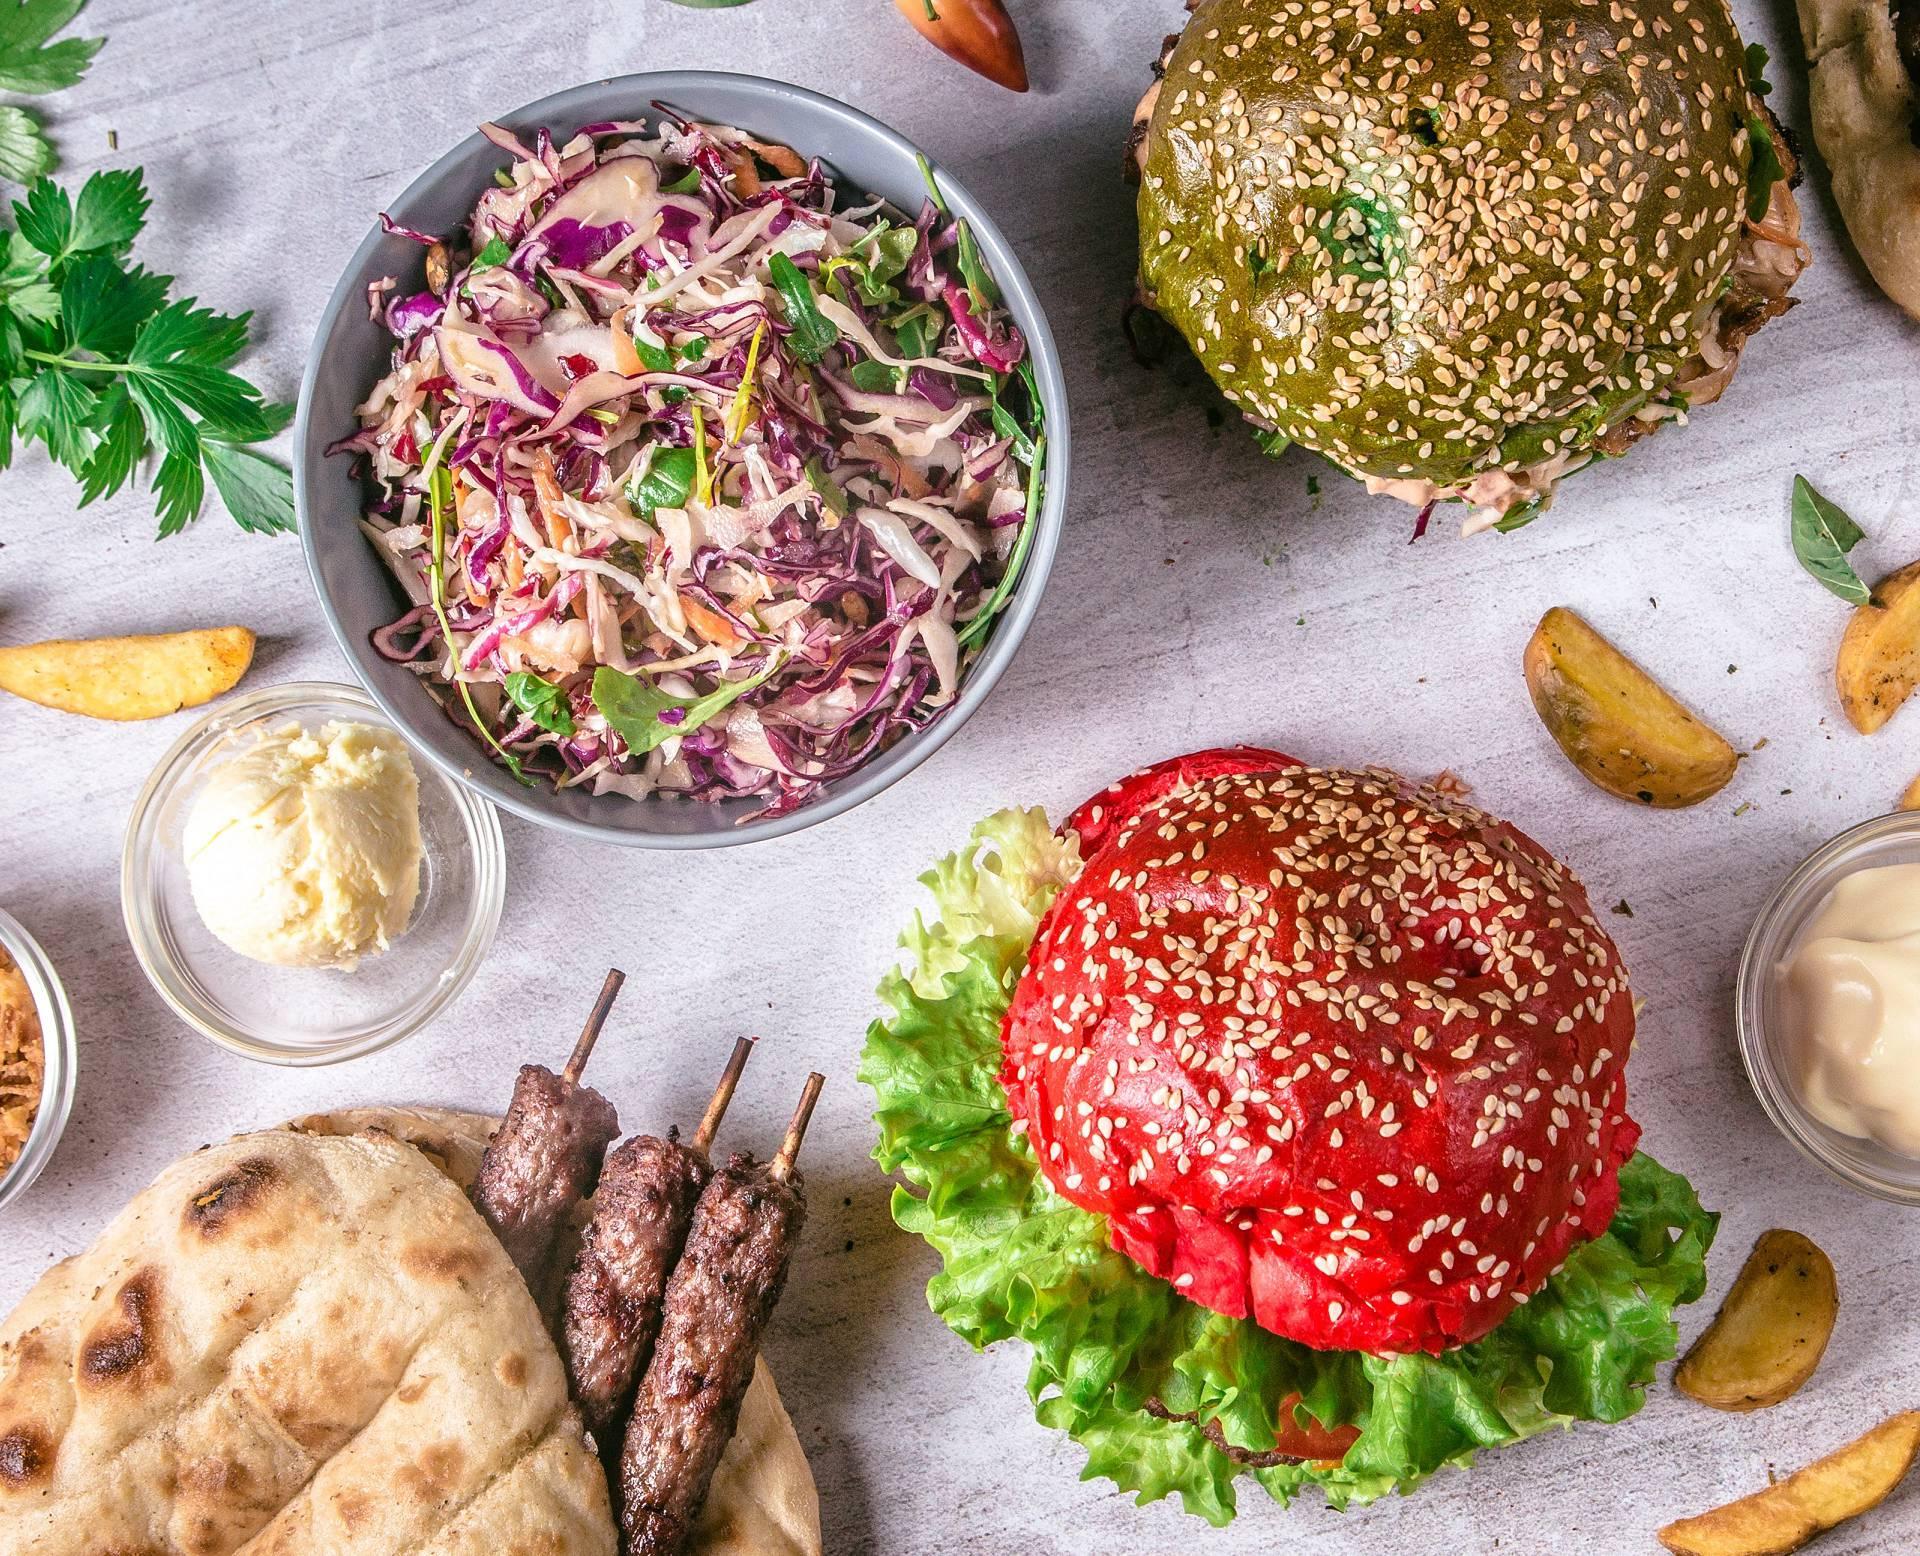 Kitchen&Grill Plac: Naš recept za genijalnu marinadu i salatu